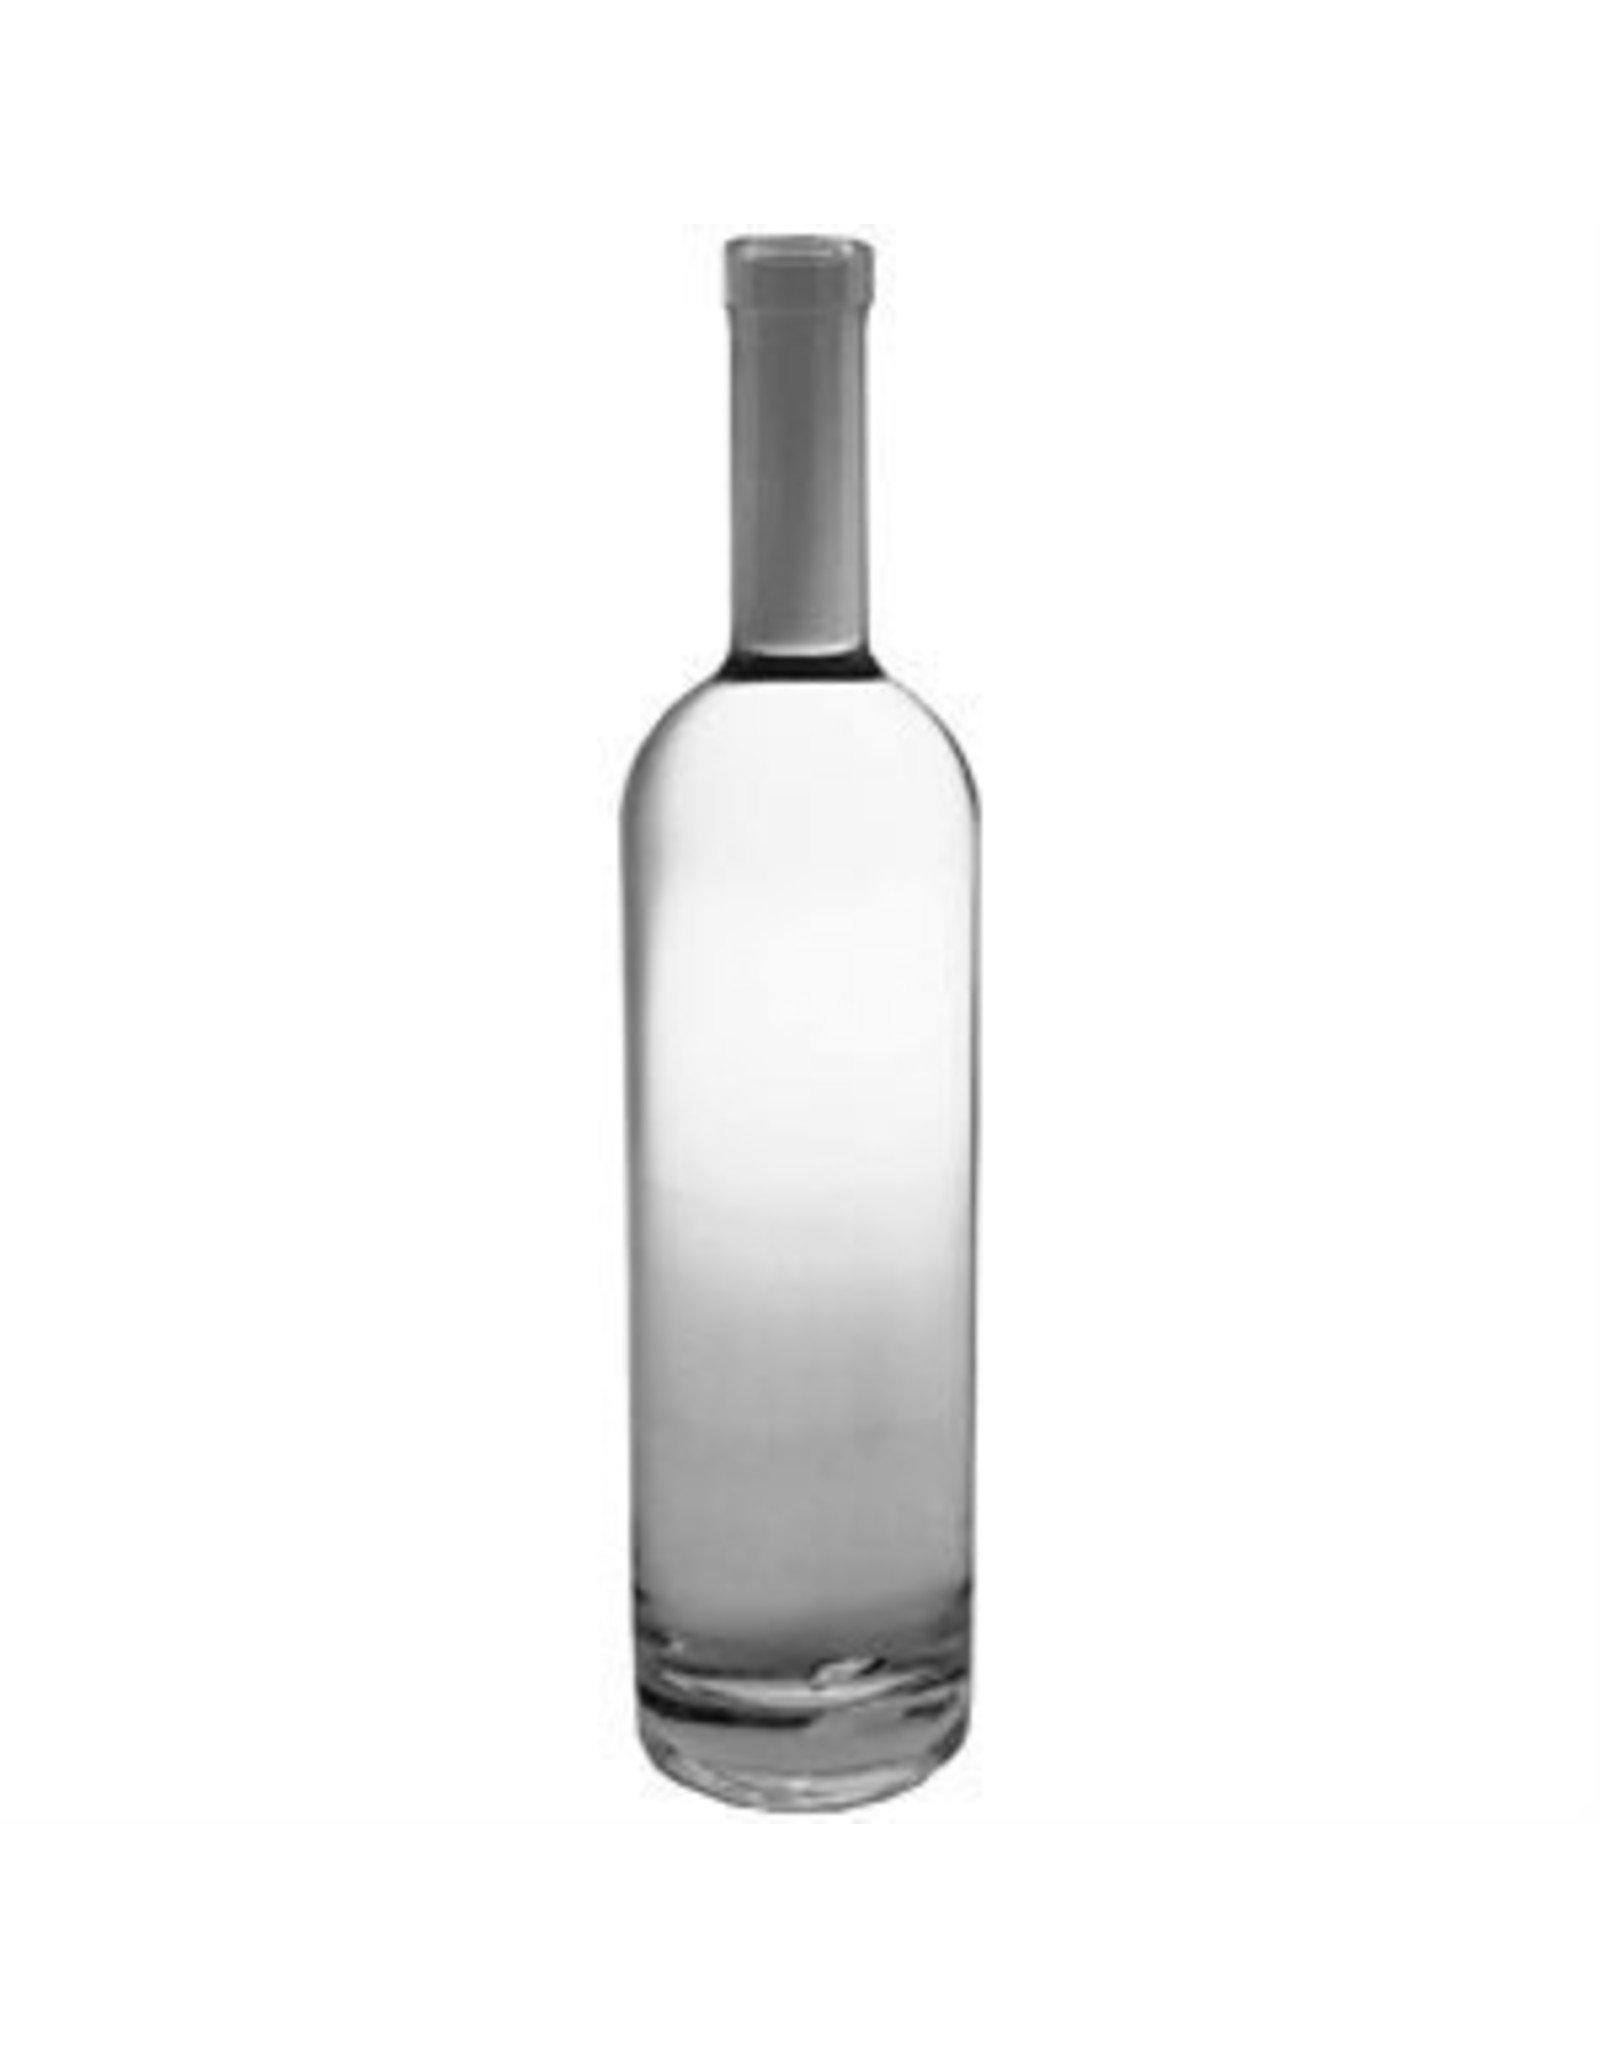 750 ml Flint Arizona Design Spirit Bottle Single